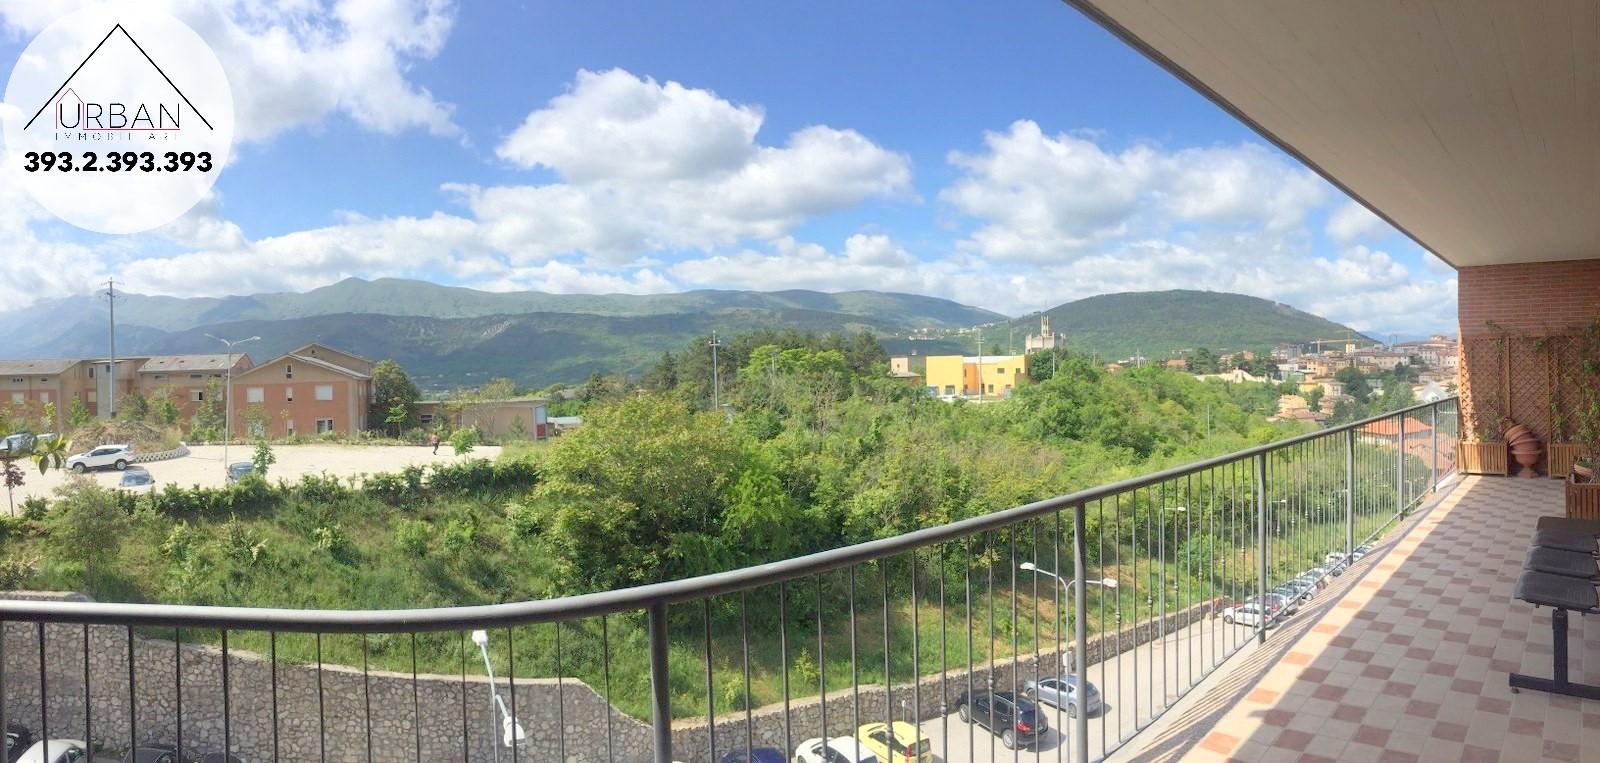 L'AQUILA (AQ) - Via Avezzano